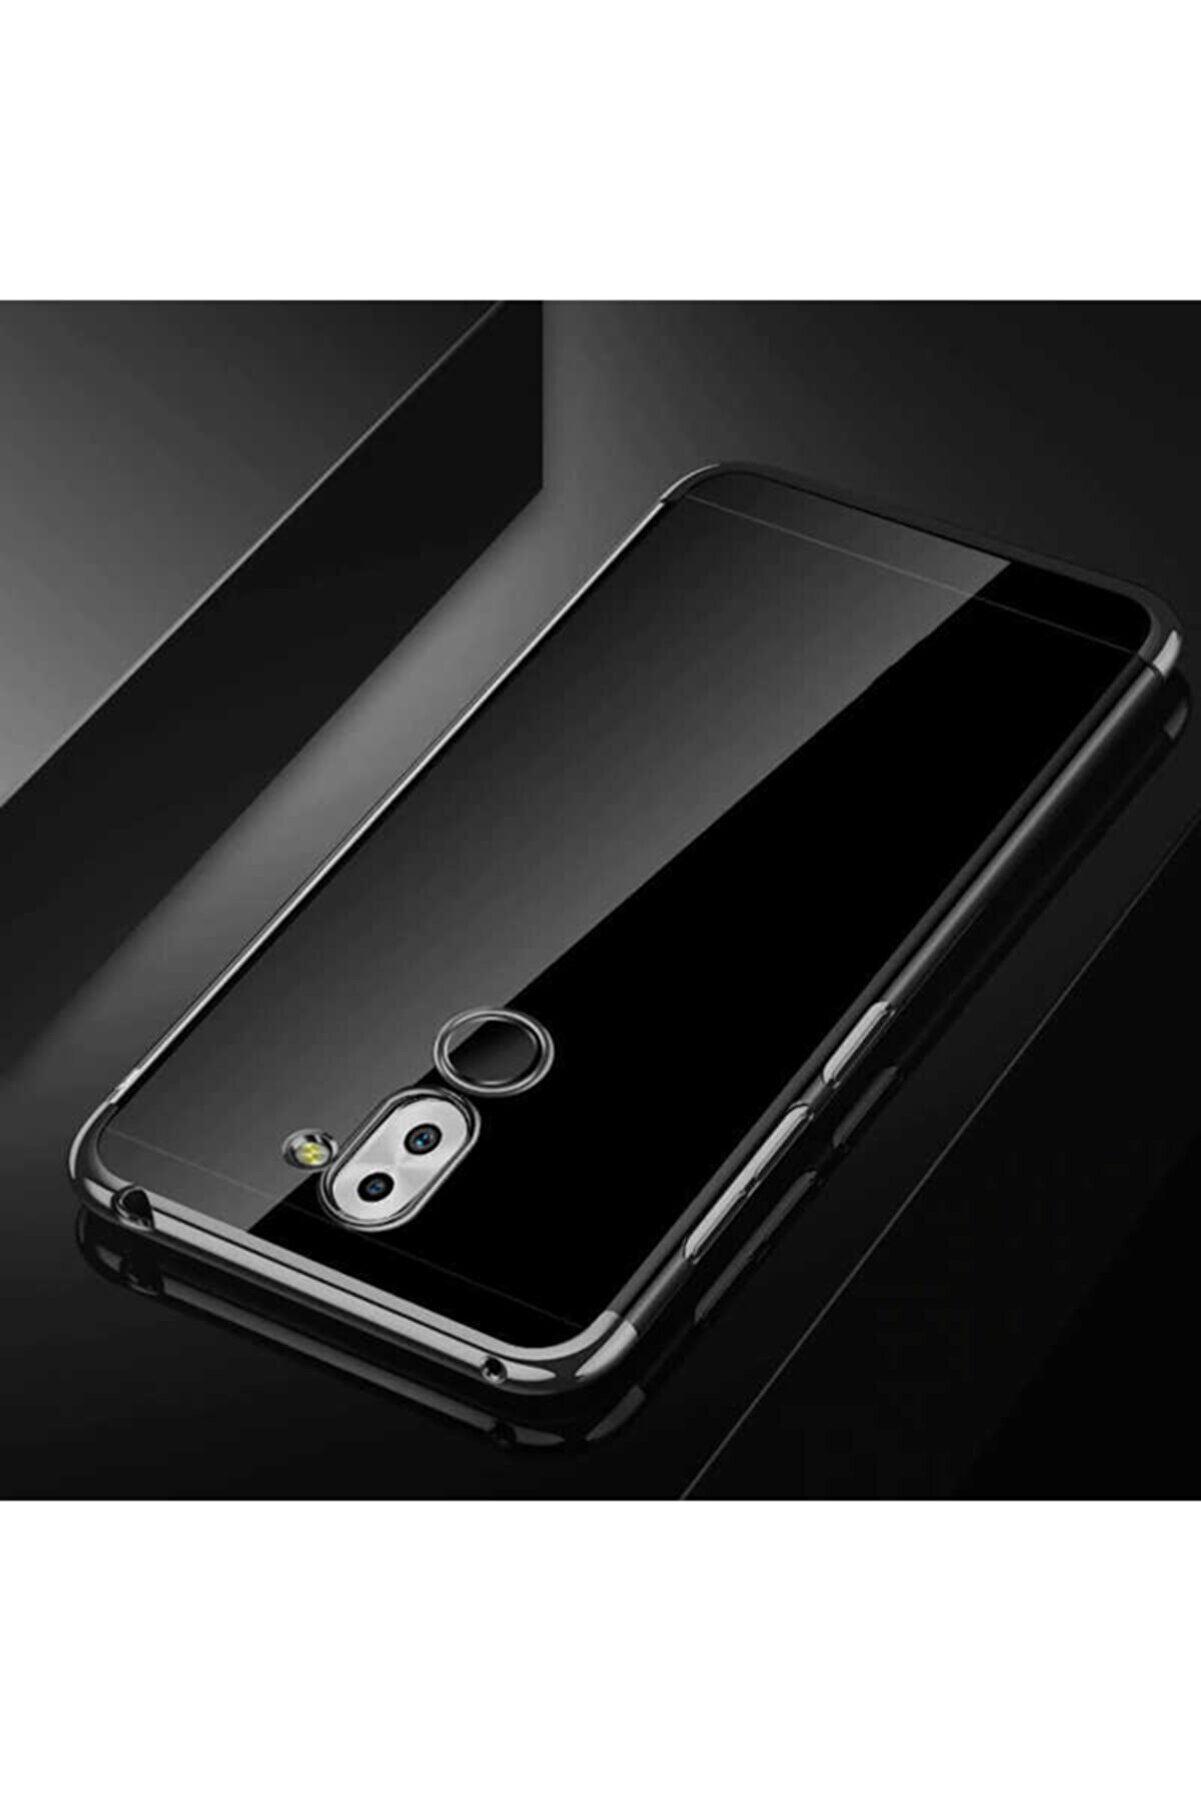 Huawei Mate 20 Lite Kılıf Lazer Boyalı Renkli Esnek Silikon Şeffaf